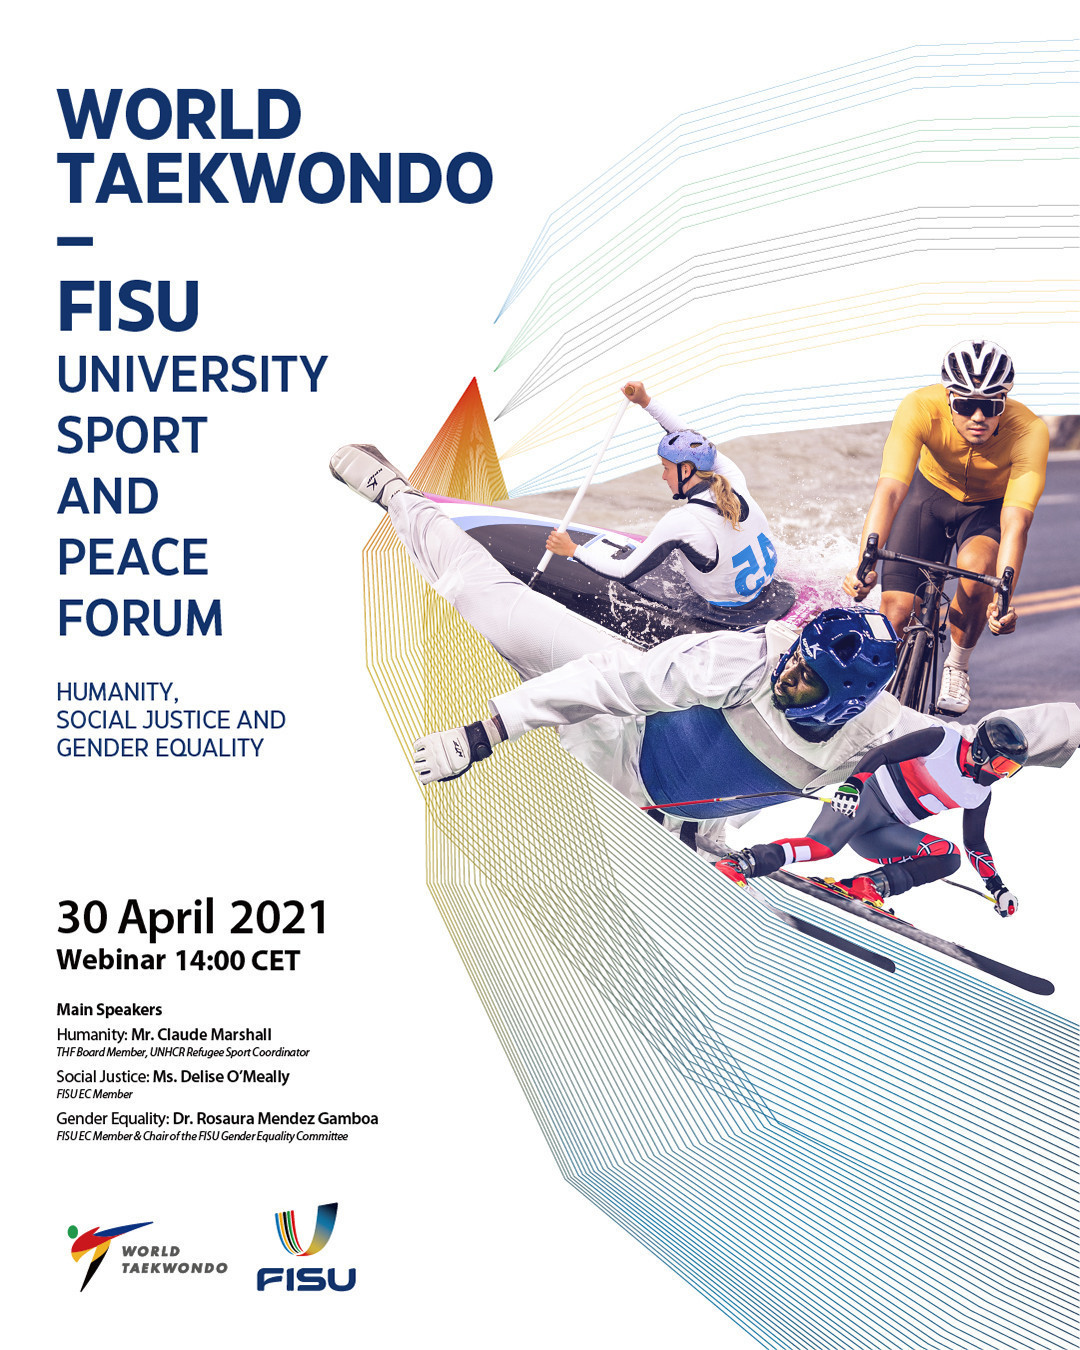 First World Taekwondo-FISU University Sport and Peace Forum hears THF Board member's plea